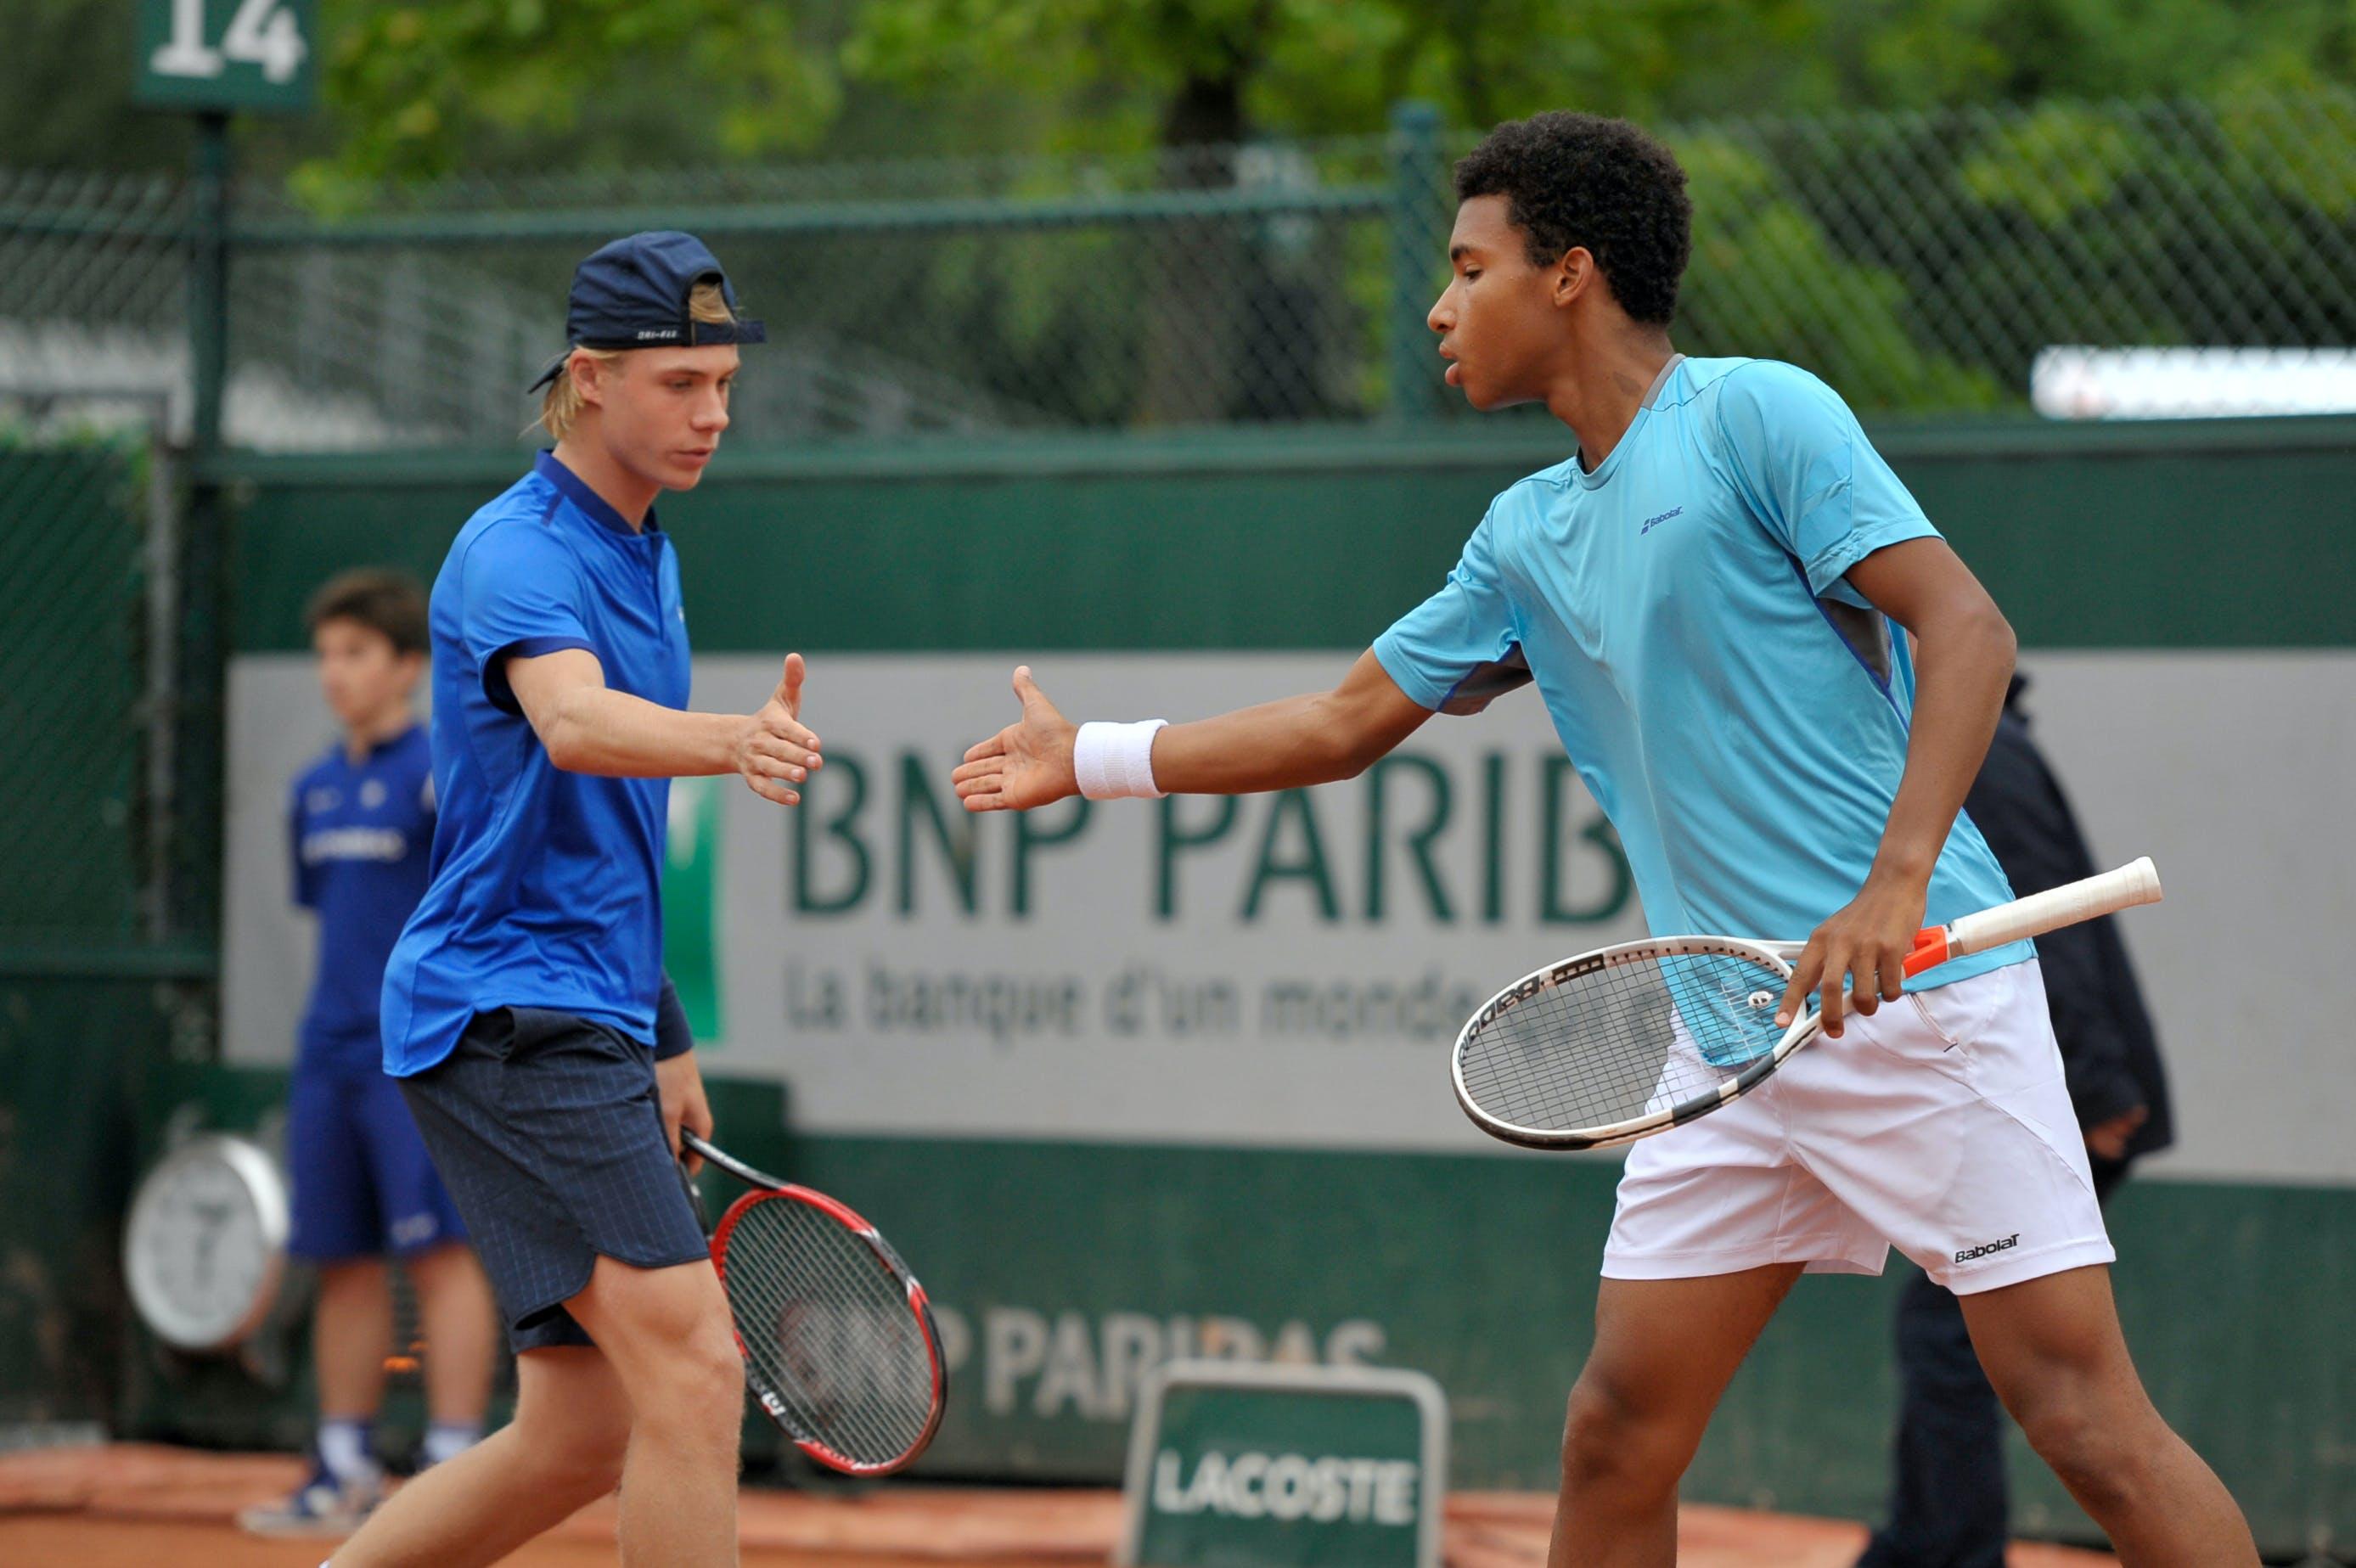 Denis Shapovalov Felix Auger Aliassime Roland-Garros junior 2016